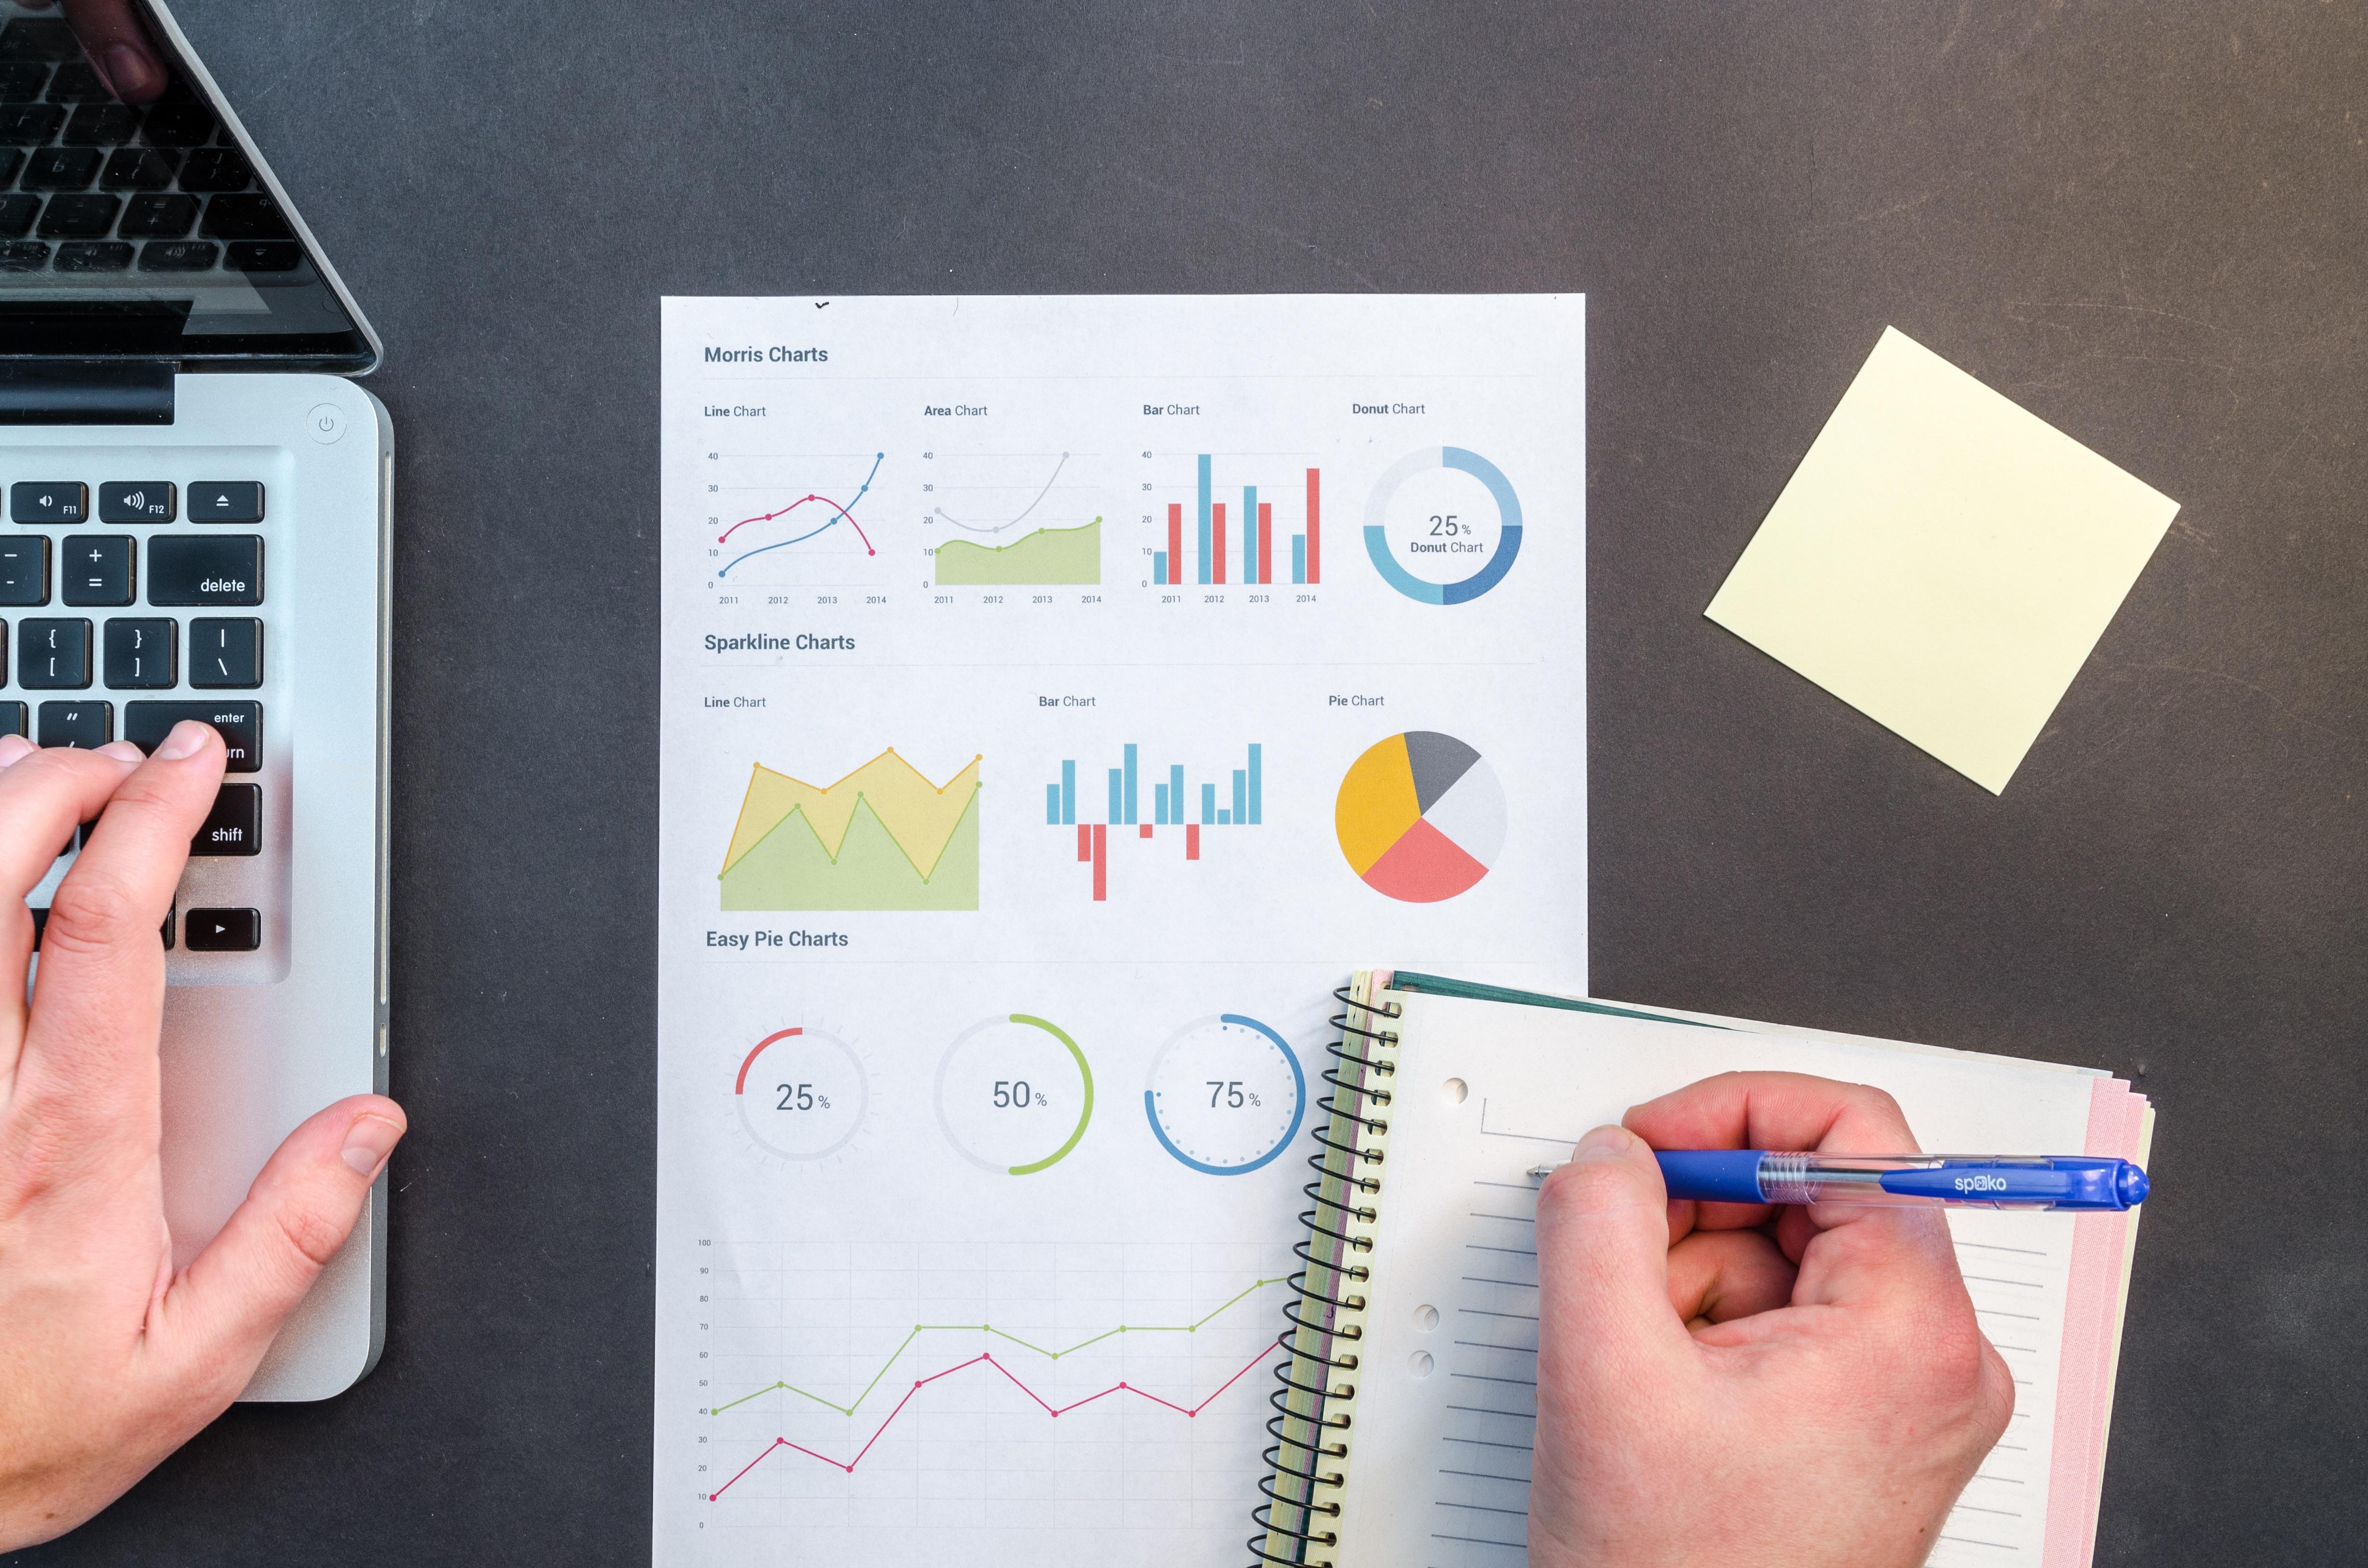 self-service business intelligence tools